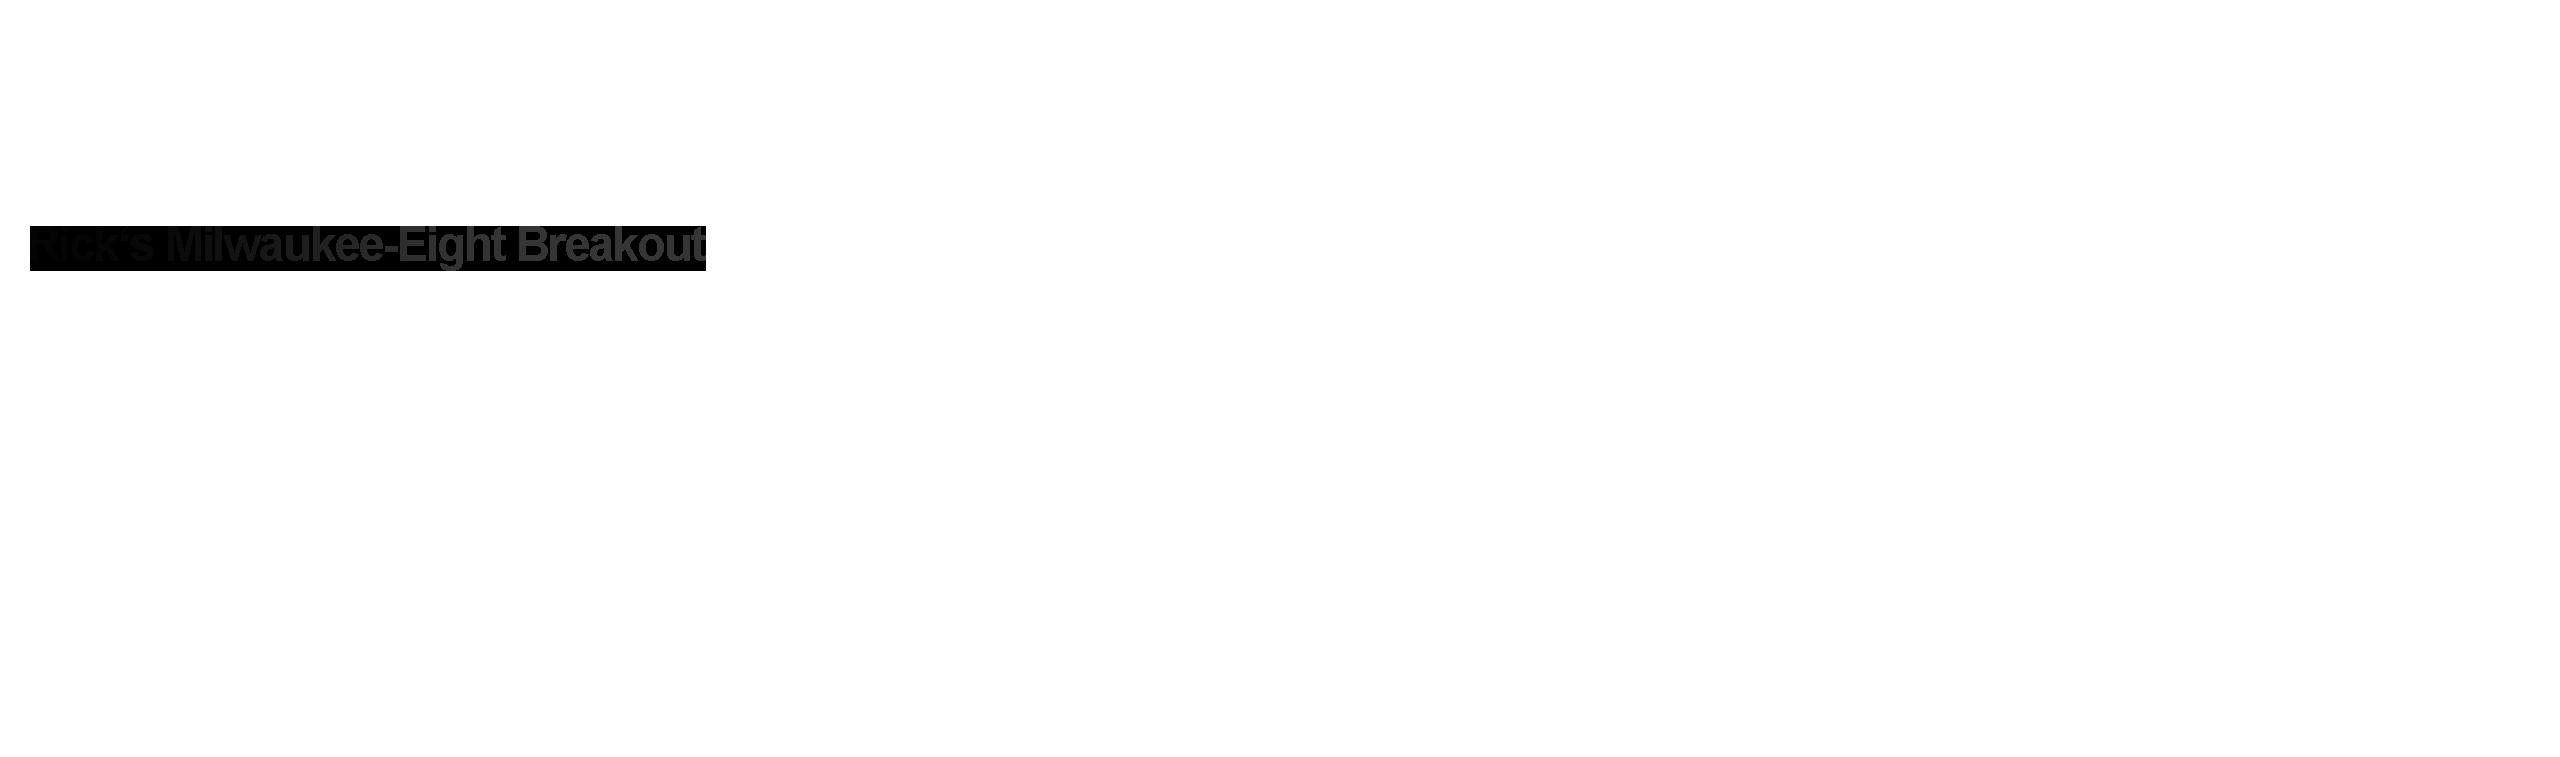 004SliderM8Breakout